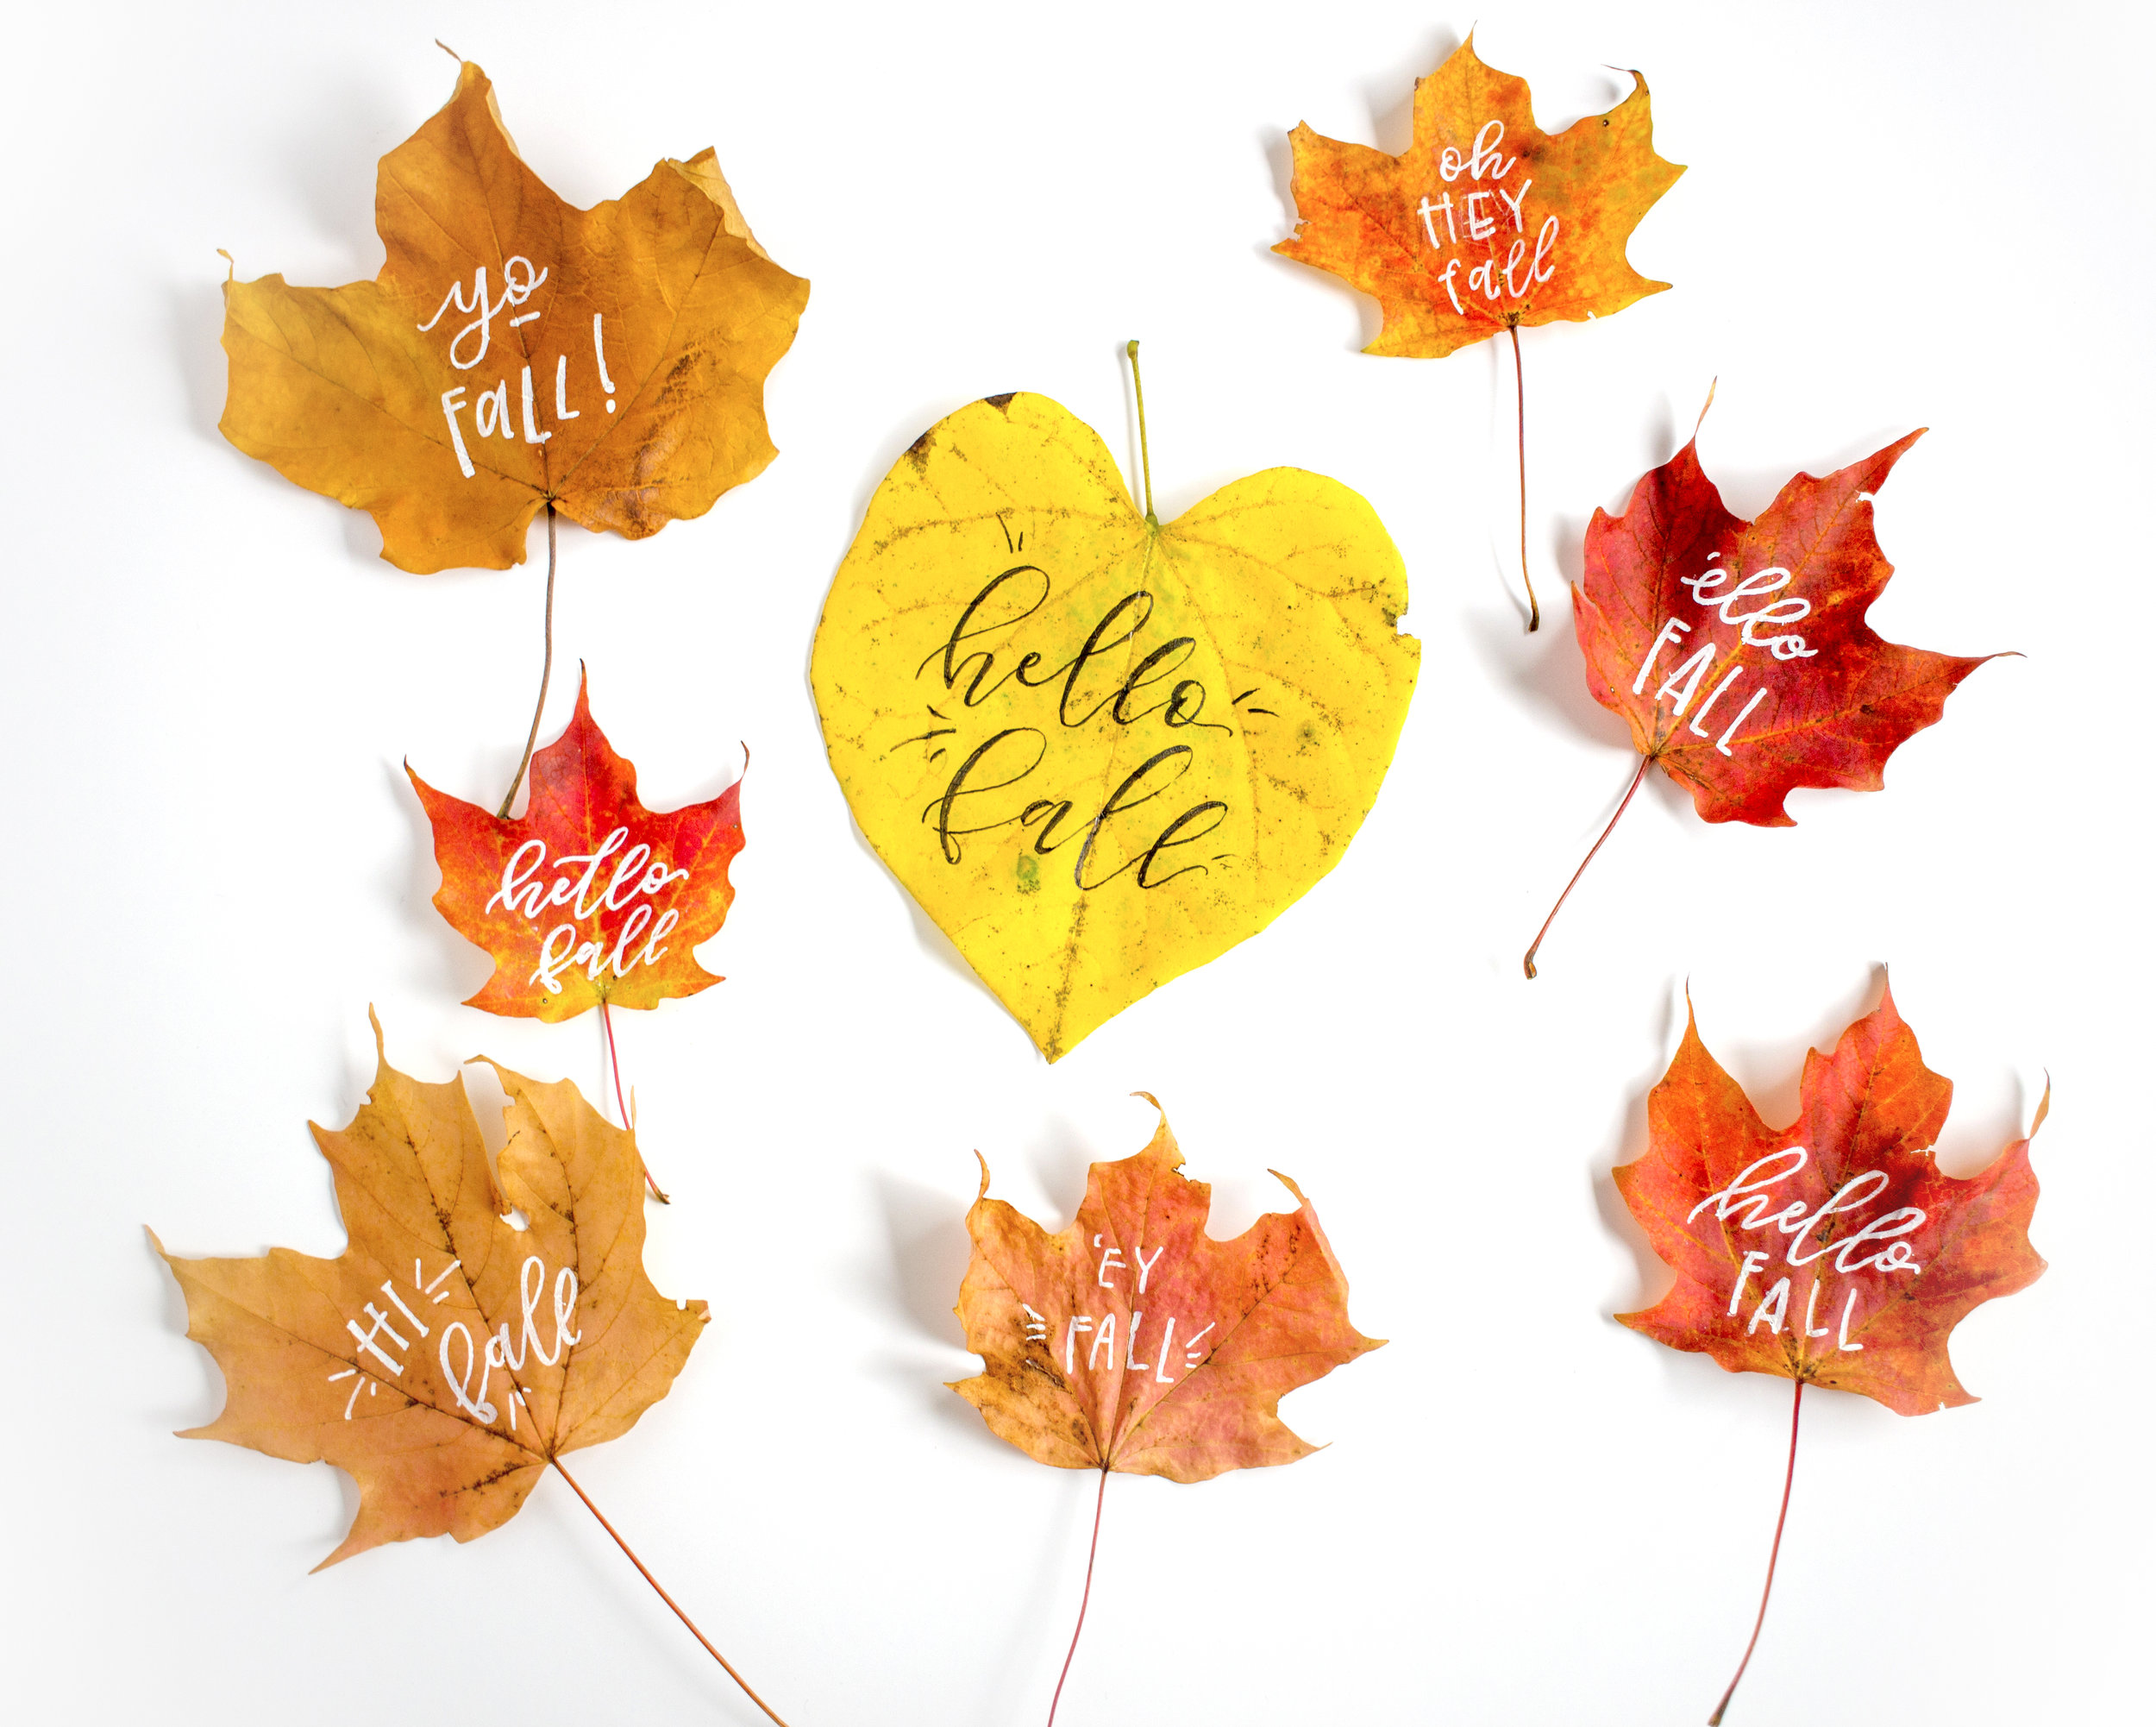 Lettering on leaves